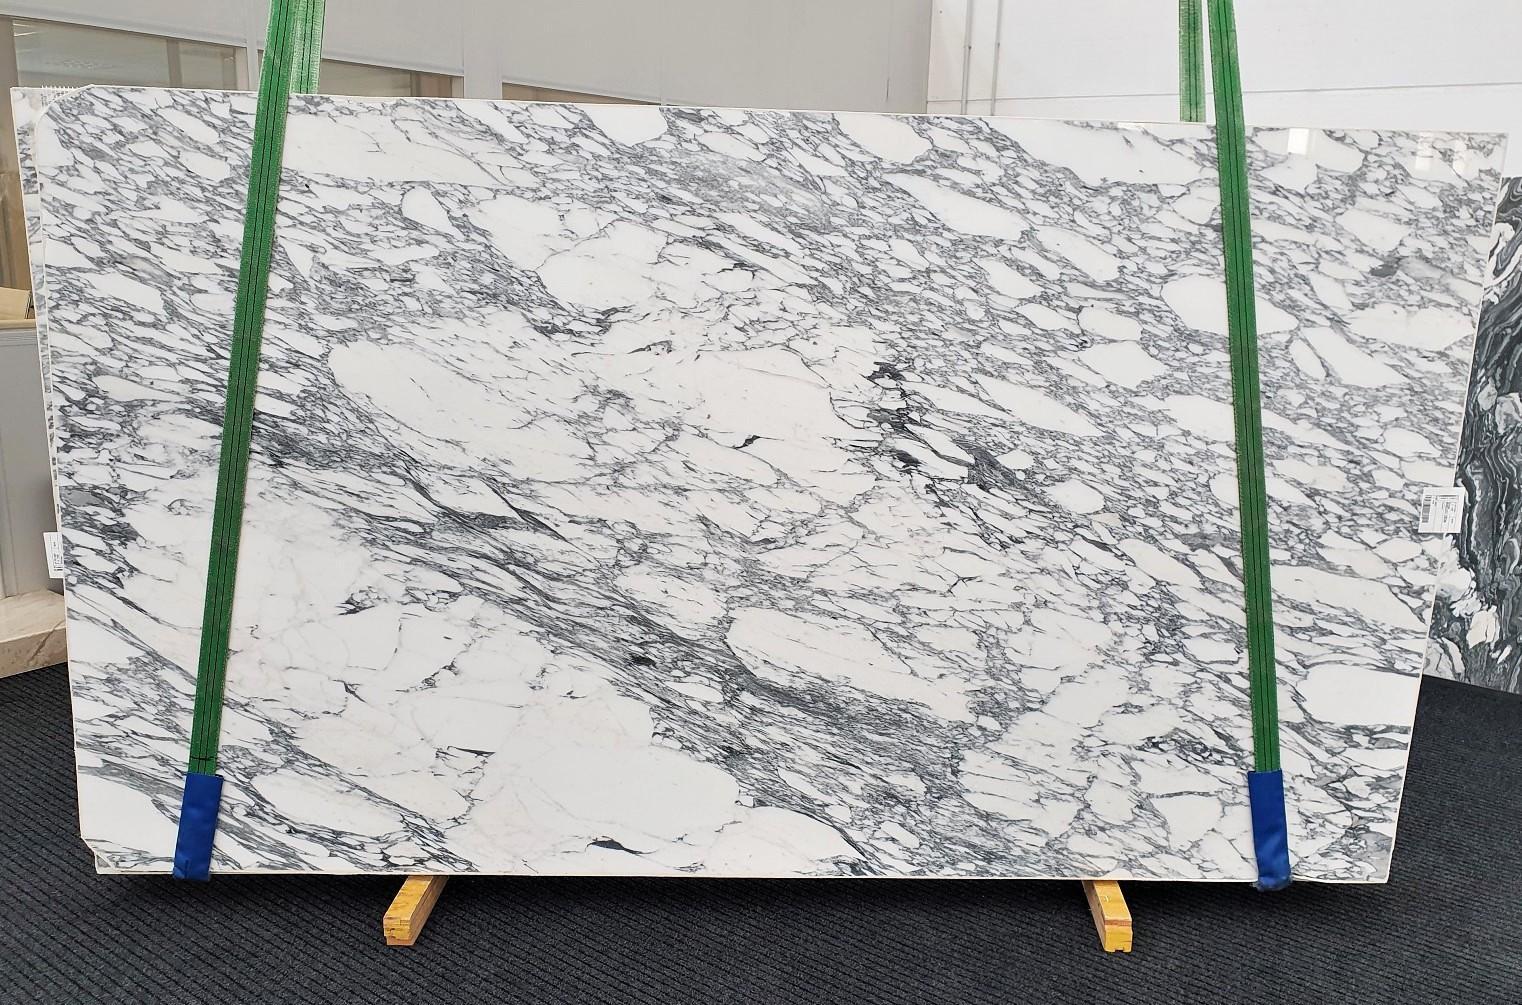 ARABESCATO CORCHIA polierte Unmaßplatten 1420 aus Natur Marmor , Slab #35: Lieferung Veneto, Italien